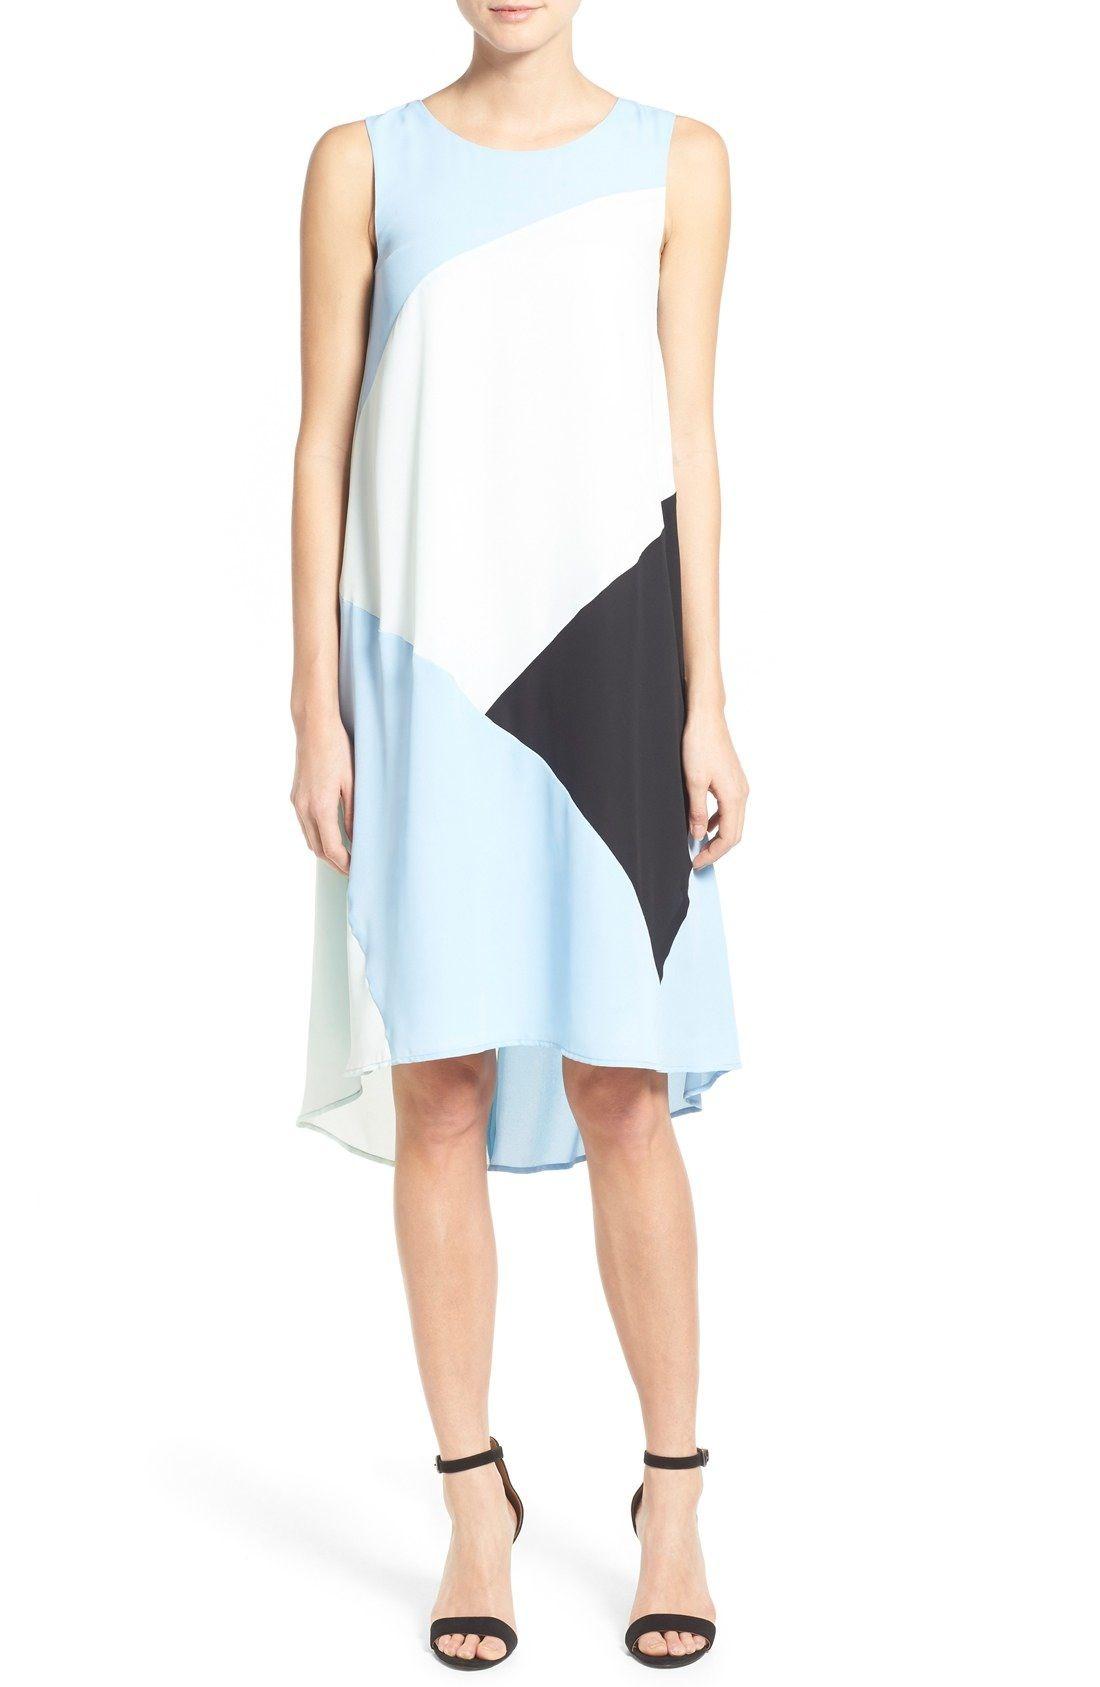 Vince camuto colorblock dresses